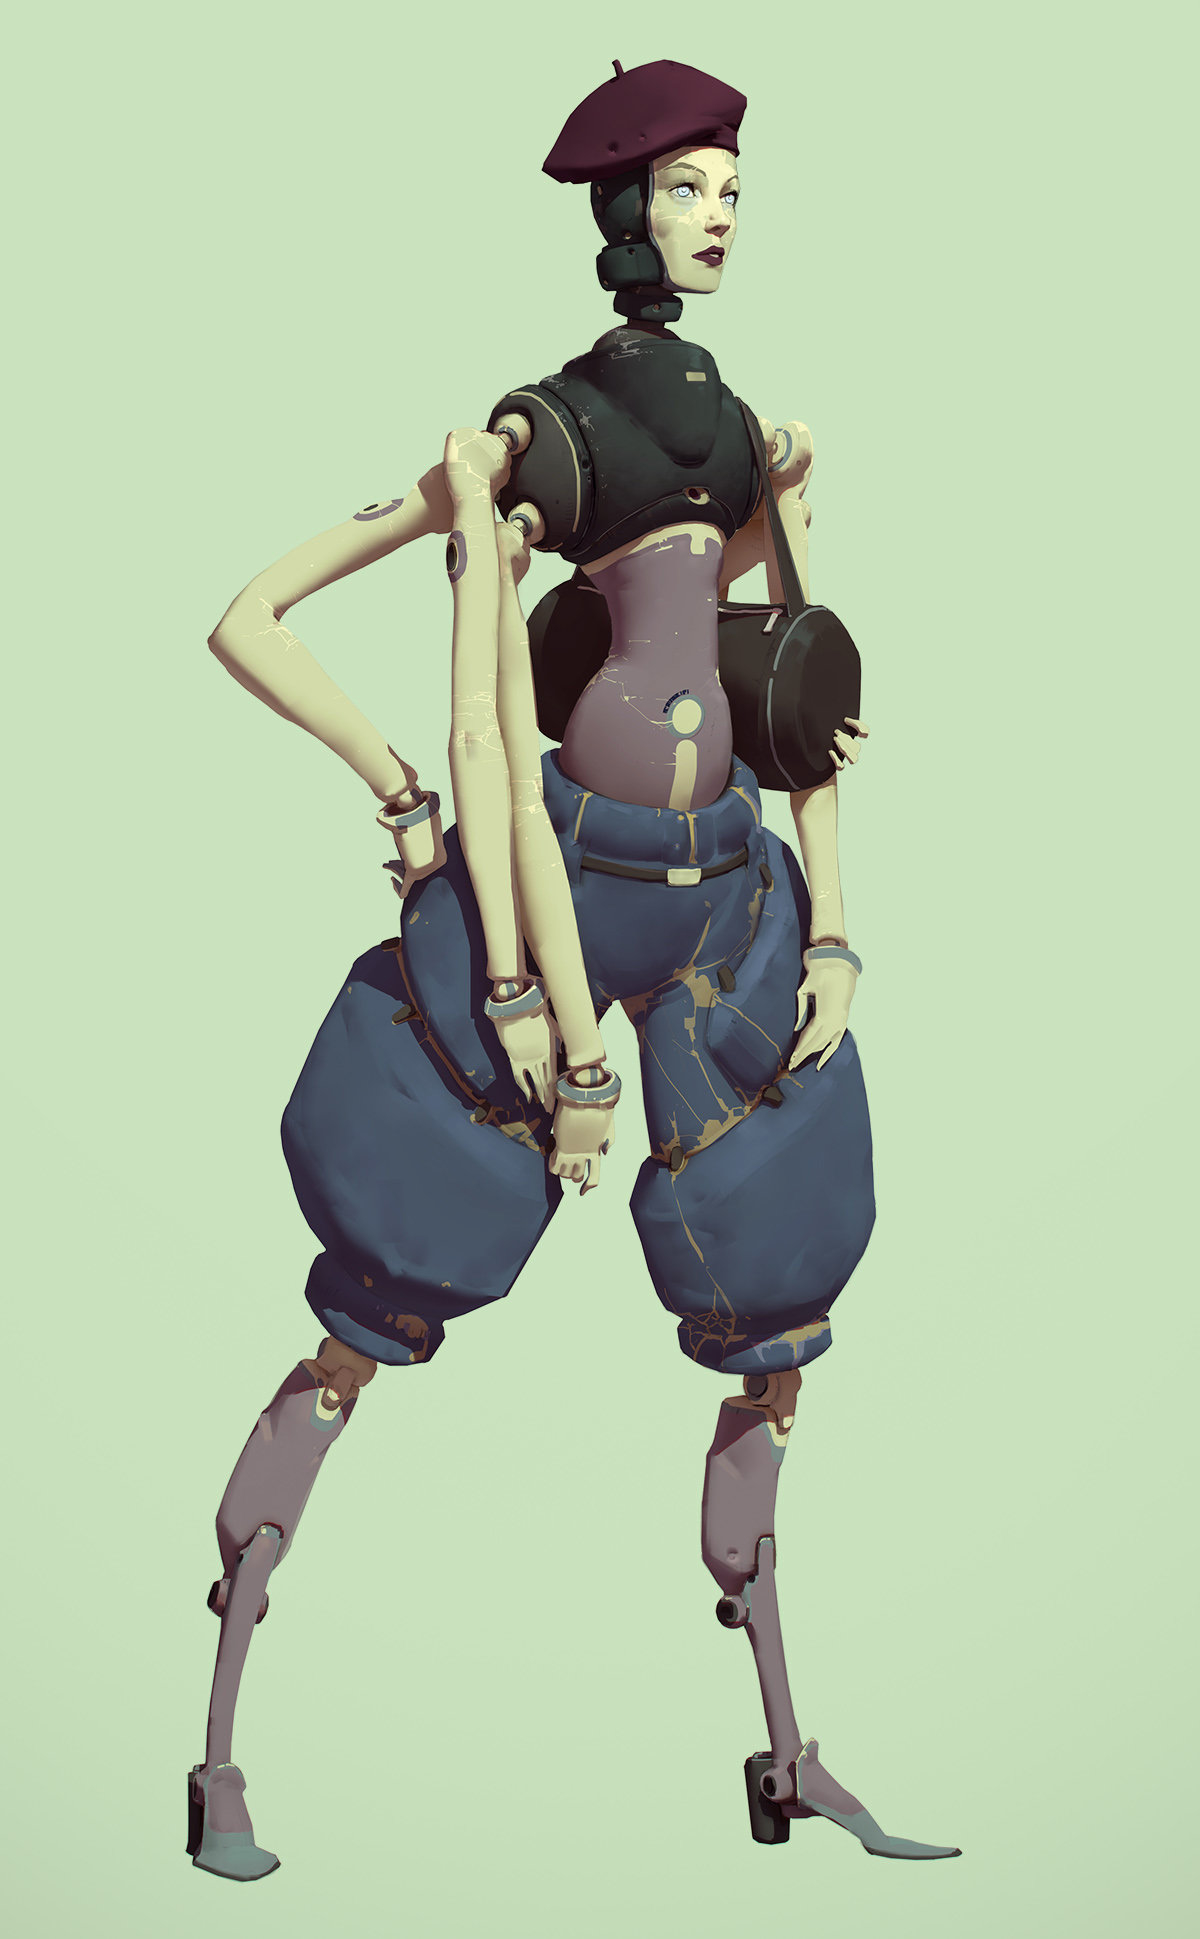 Rahmatozz robotic artist girl 1 8ff55aed 6gak